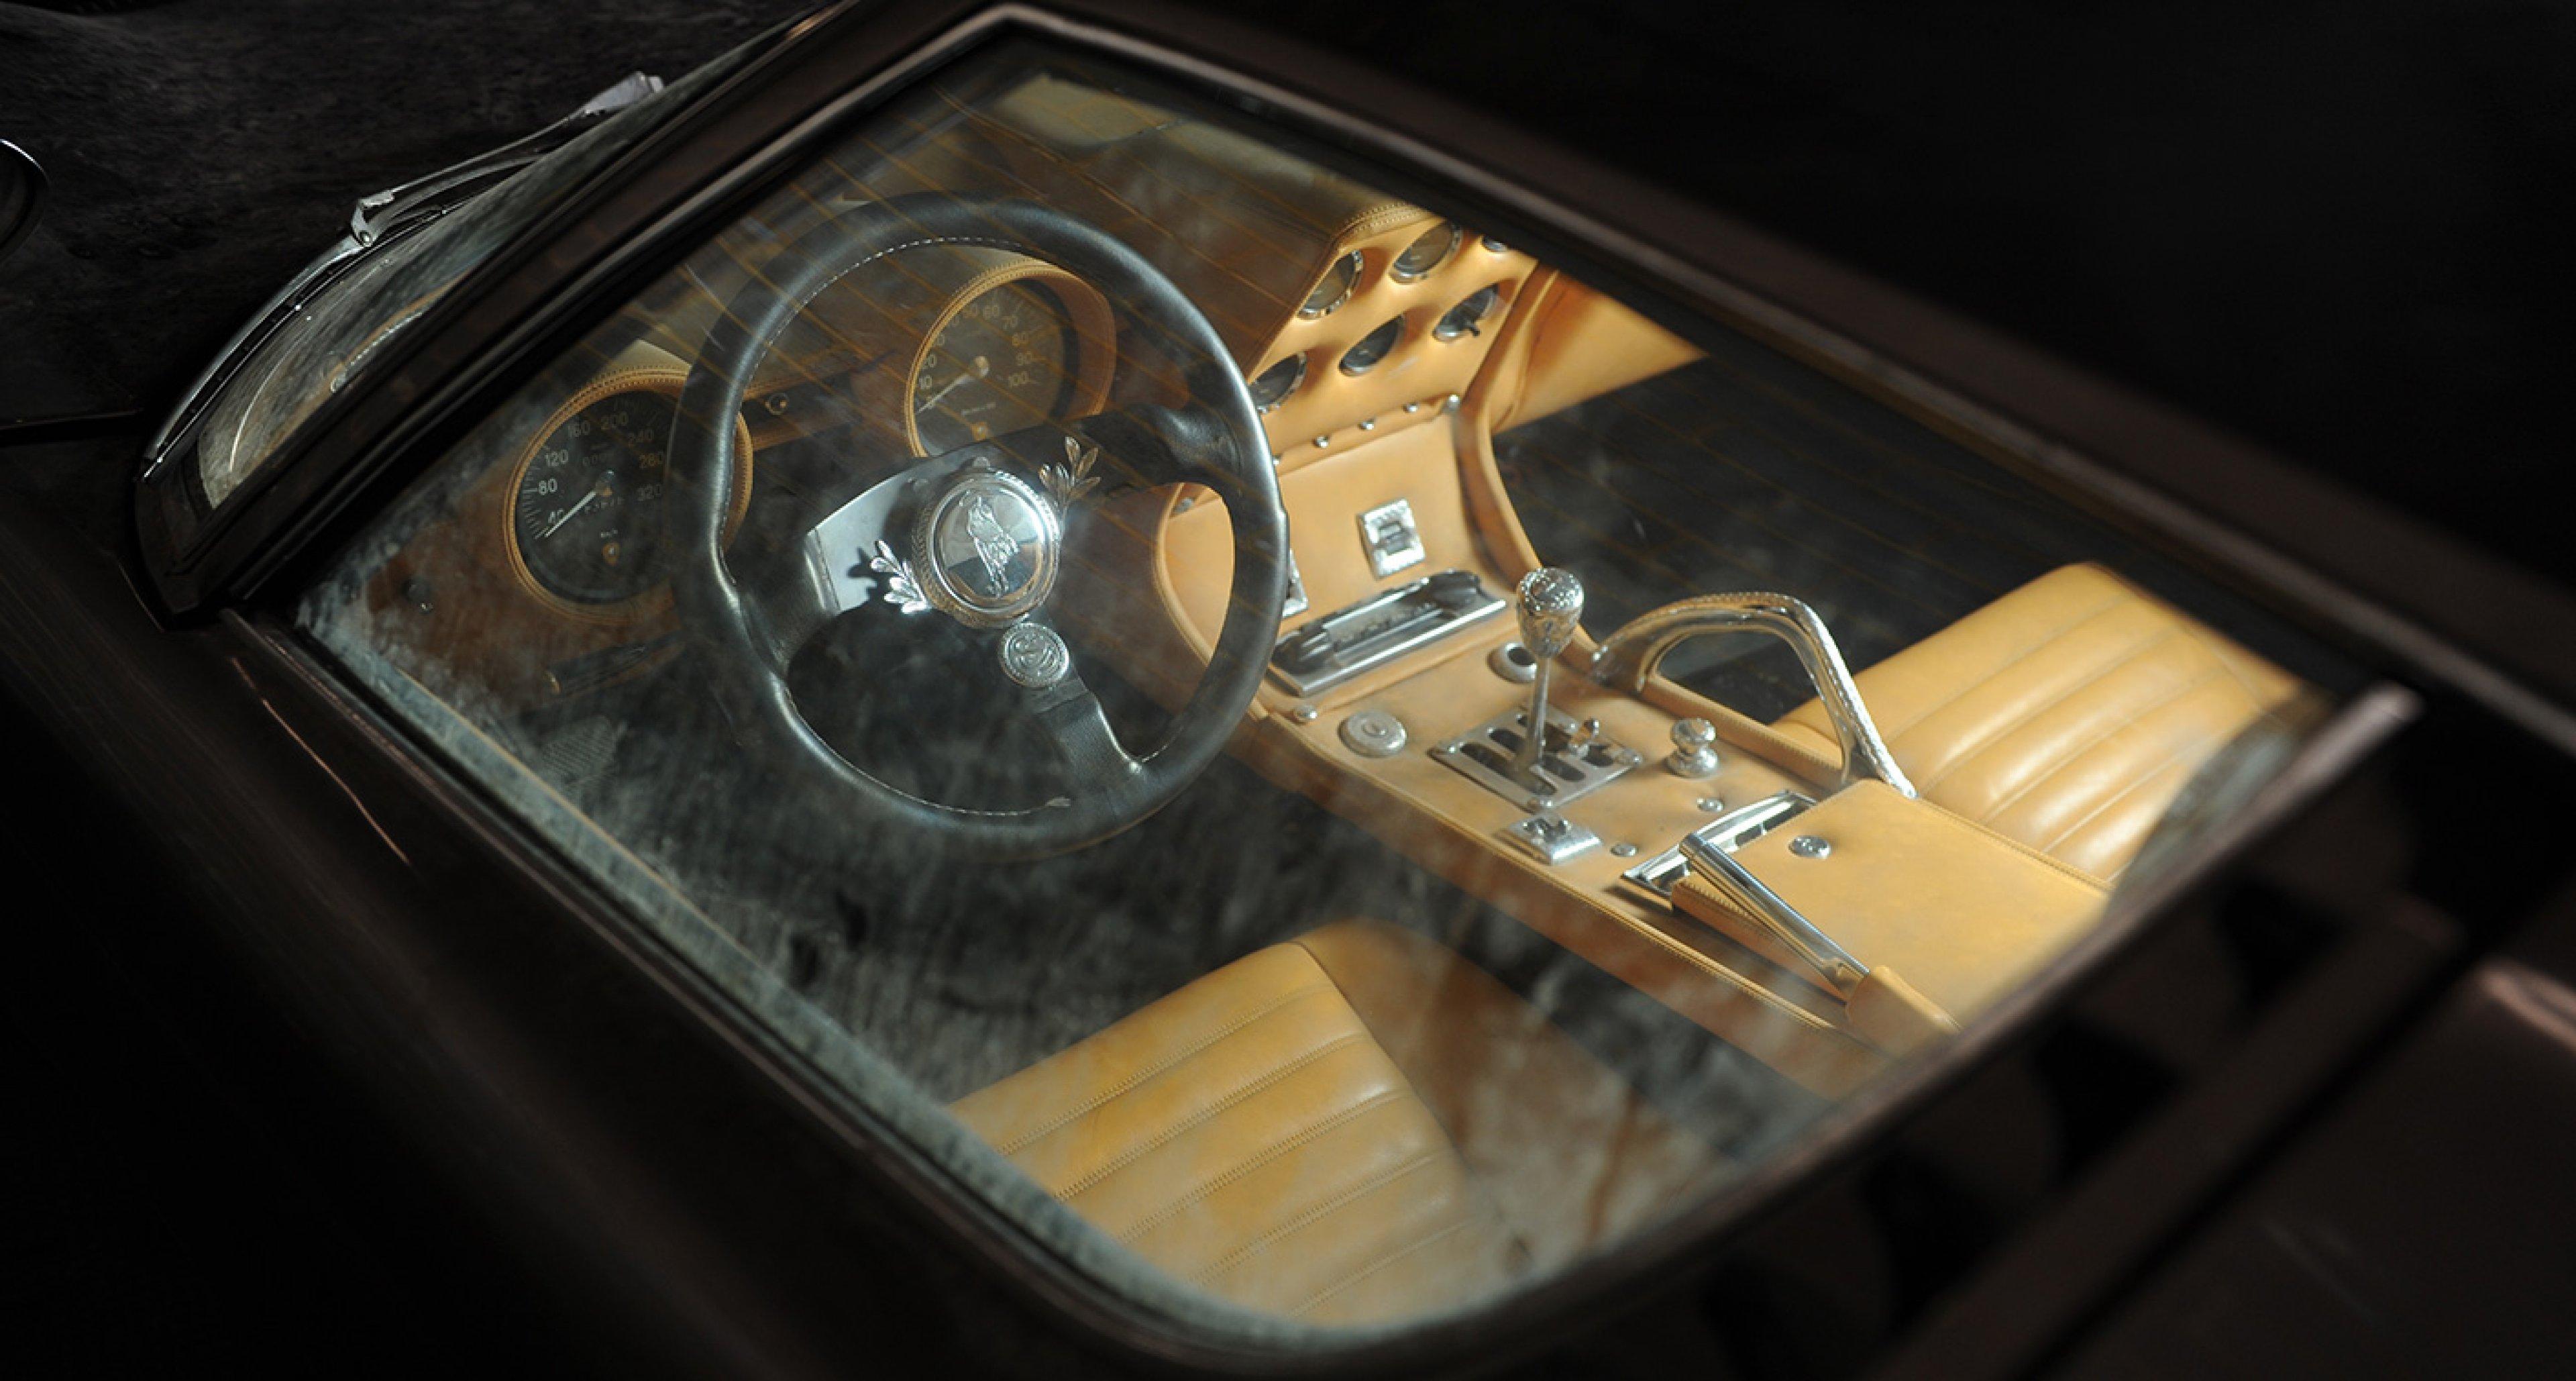 Lamborghini Miura auctioned by Coys in 2013